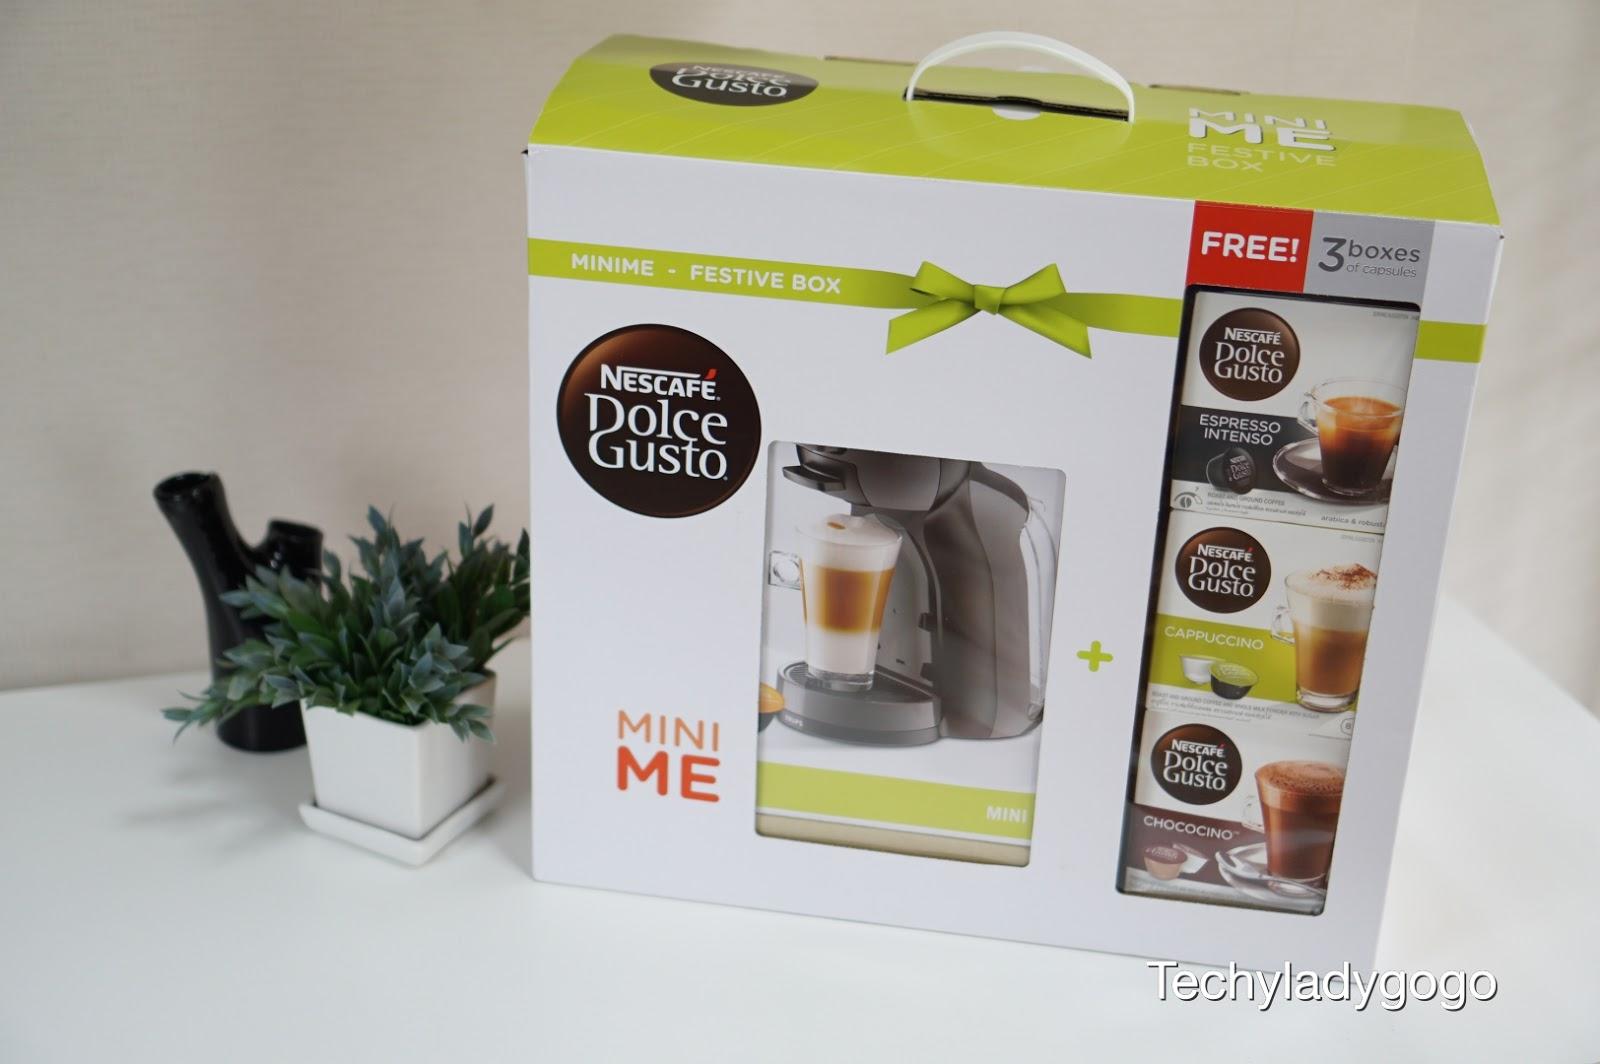 NESCAFÉ Dolce Gusto รุ่น Mini Me - FESTIVE BOX เครื่องชงกาแฟแคปซูล สุดทันสมัย ใช้ง่าย หอมอร่อยราวกับยกร้านกาแฟมาไว้ที่บ้าน เนสกาแฟ ดอลเช่ กุสโต้ nescafe capsule coffee